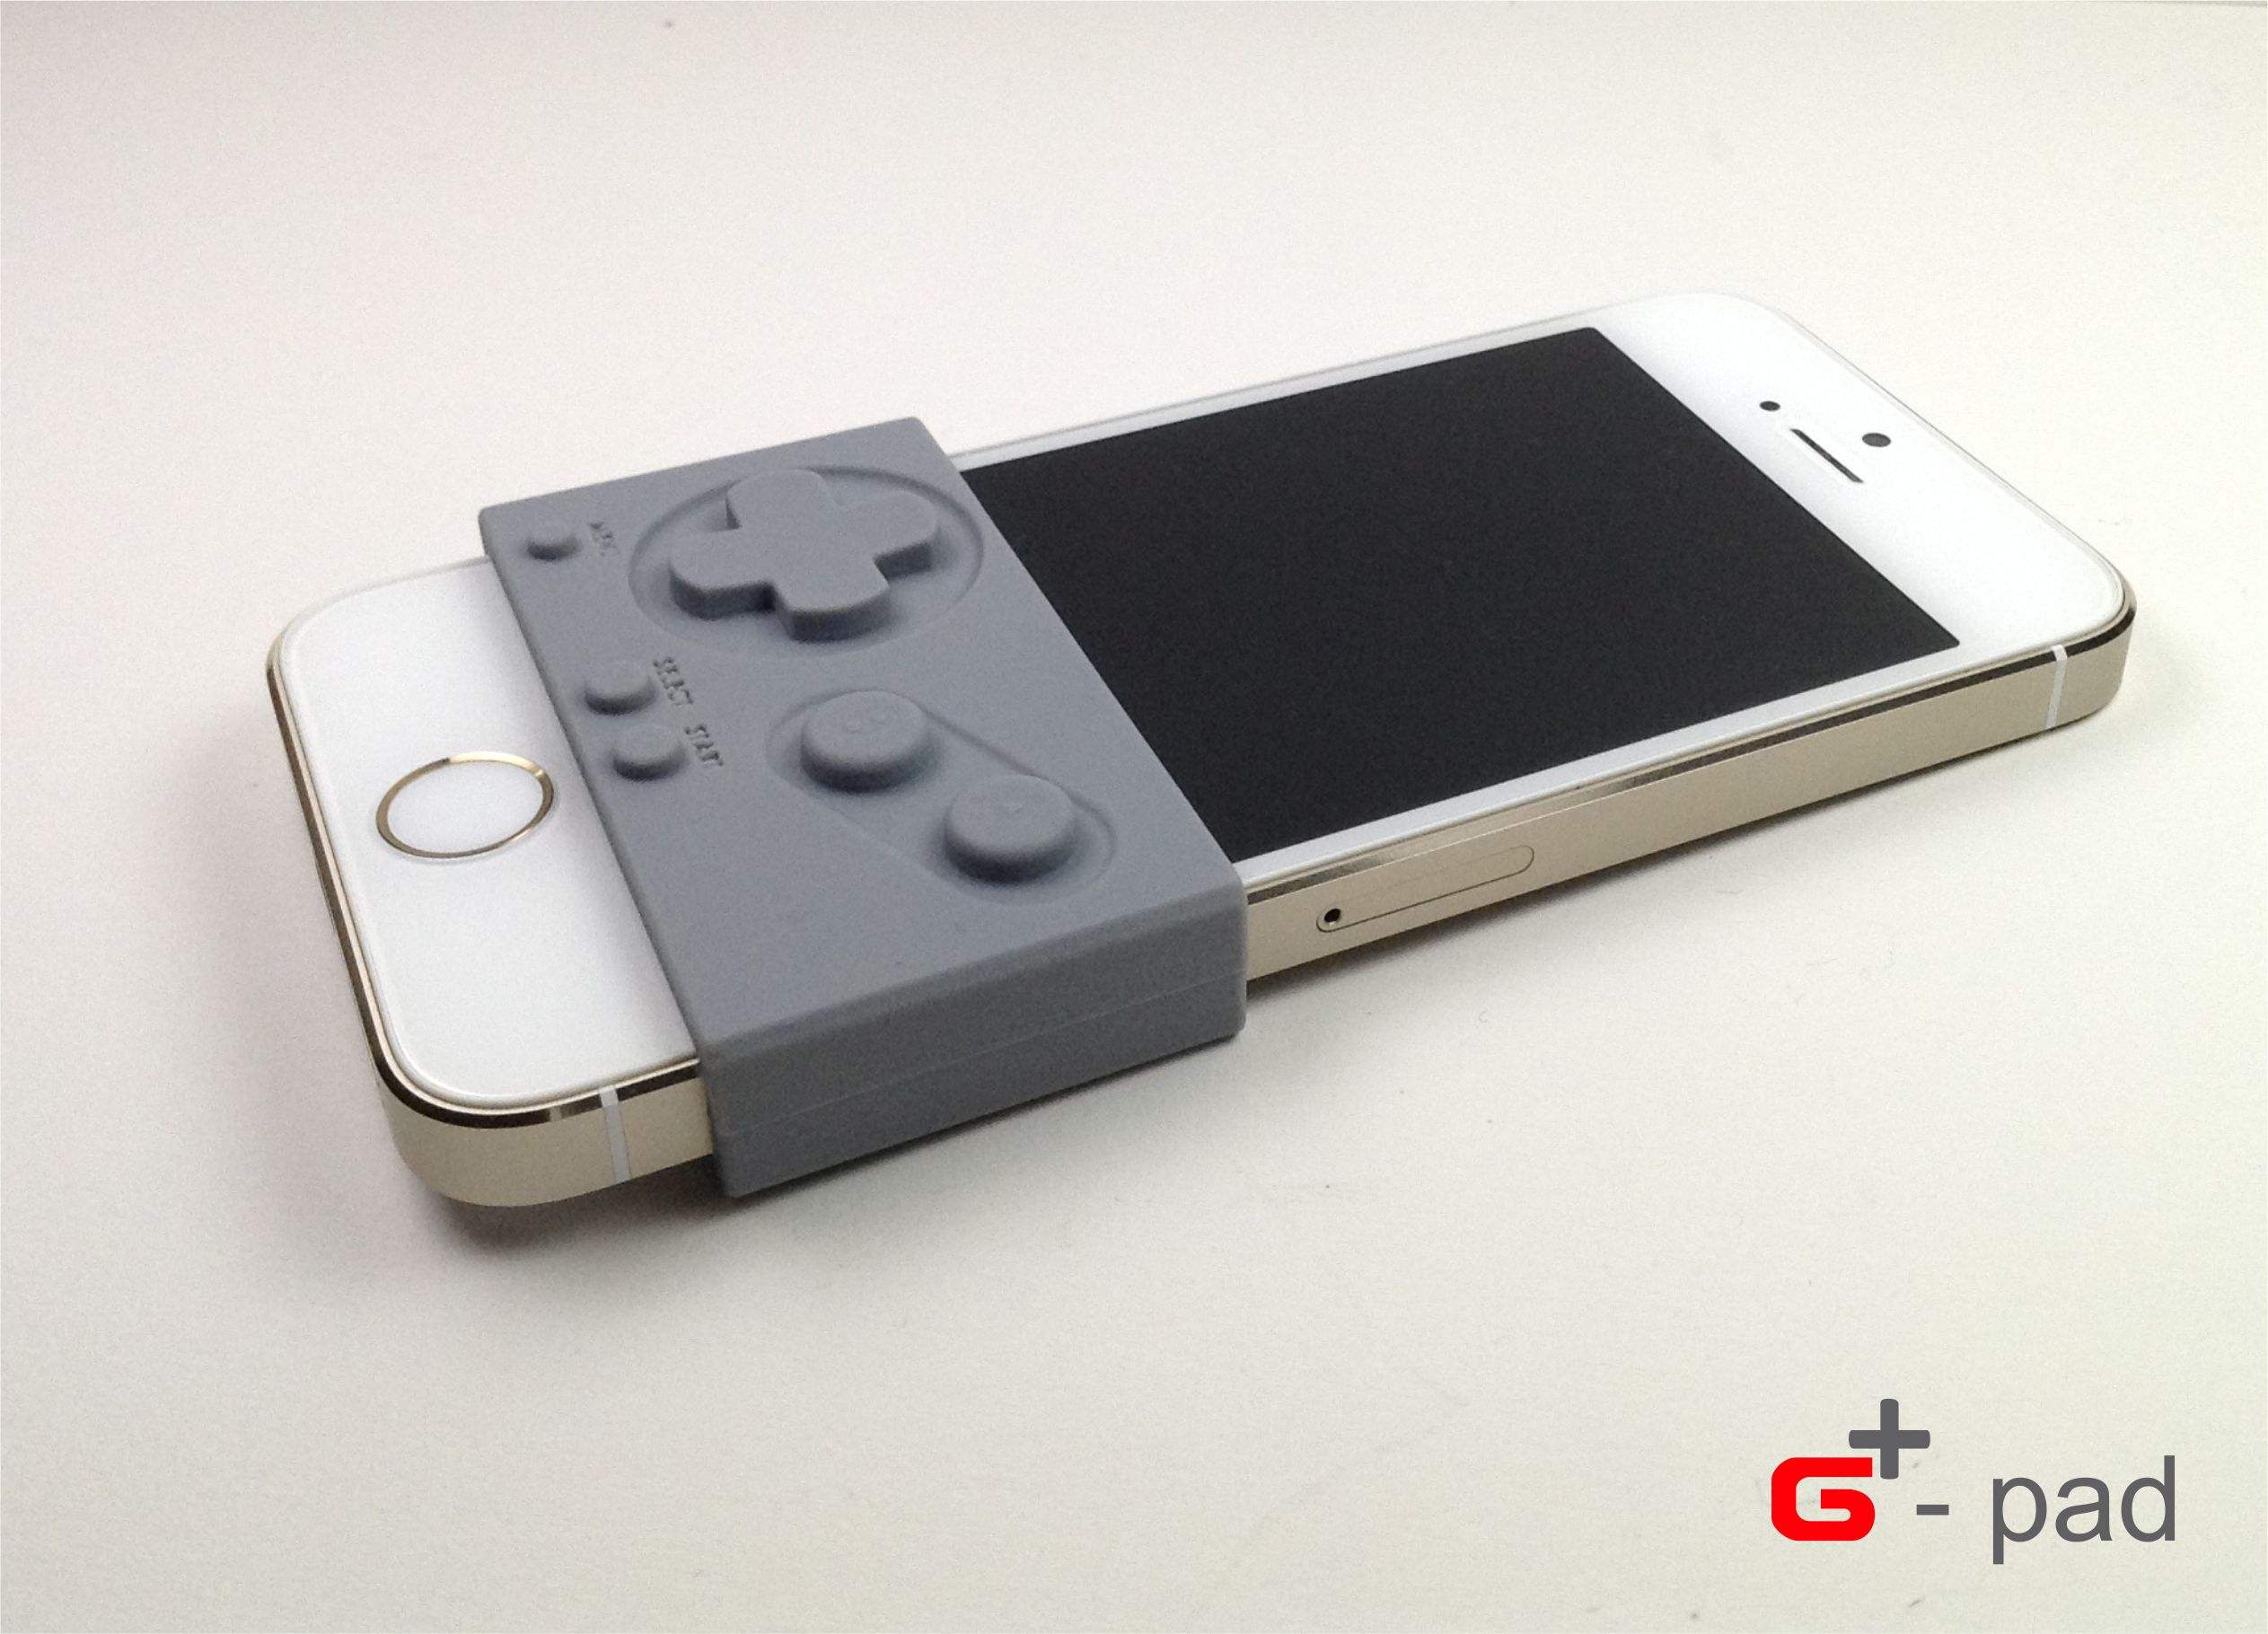 gpad transforme l 39 iphone en gameboy pour de vrai. Black Bedroom Furniture Sets. Home Design Ideas